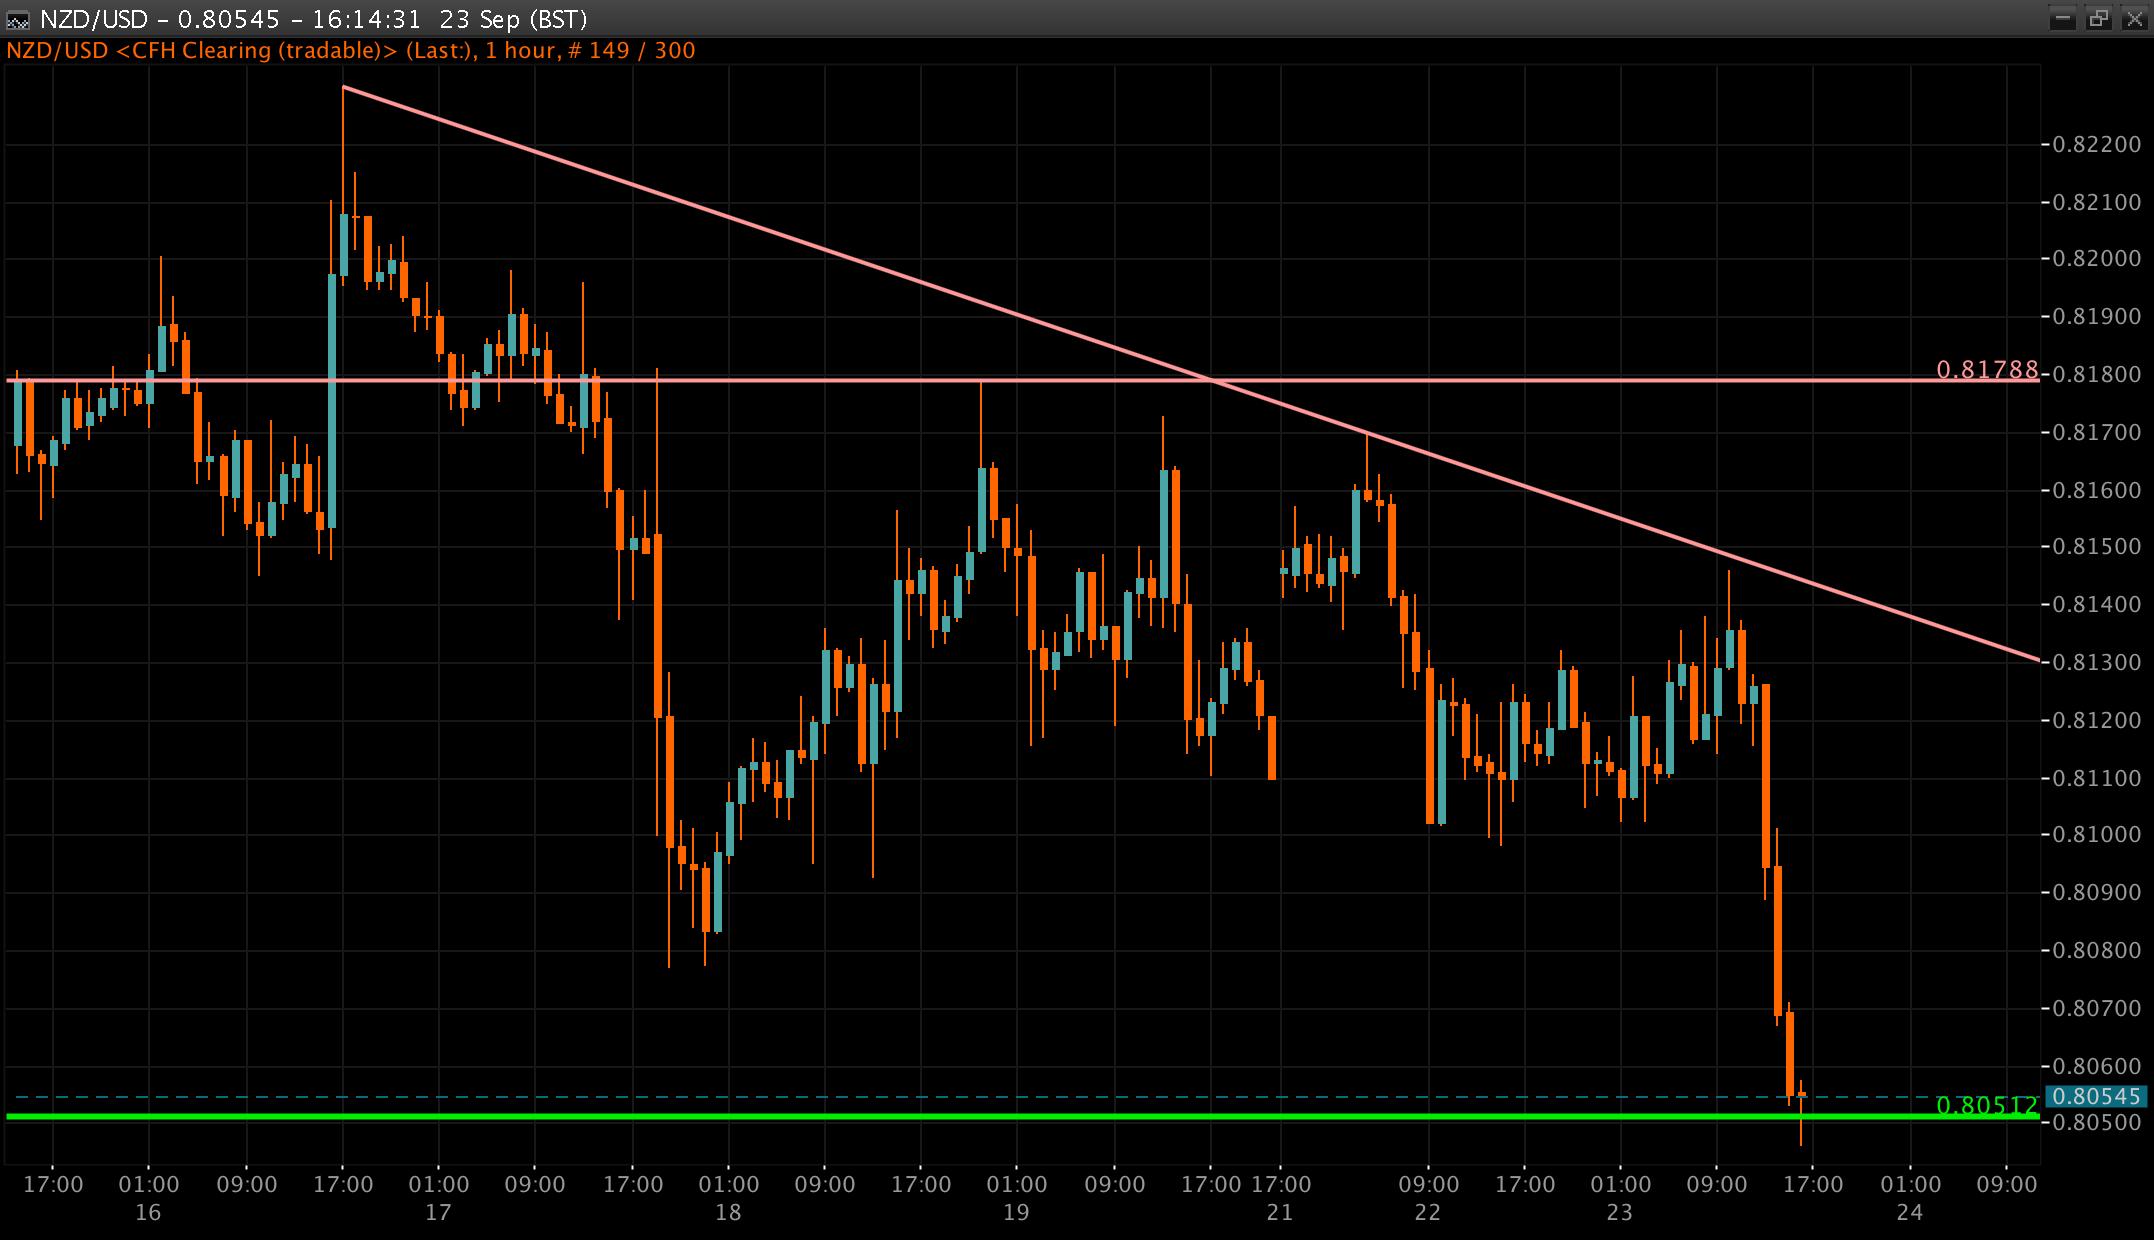 NZD/USD Chart 23 Sep 2014